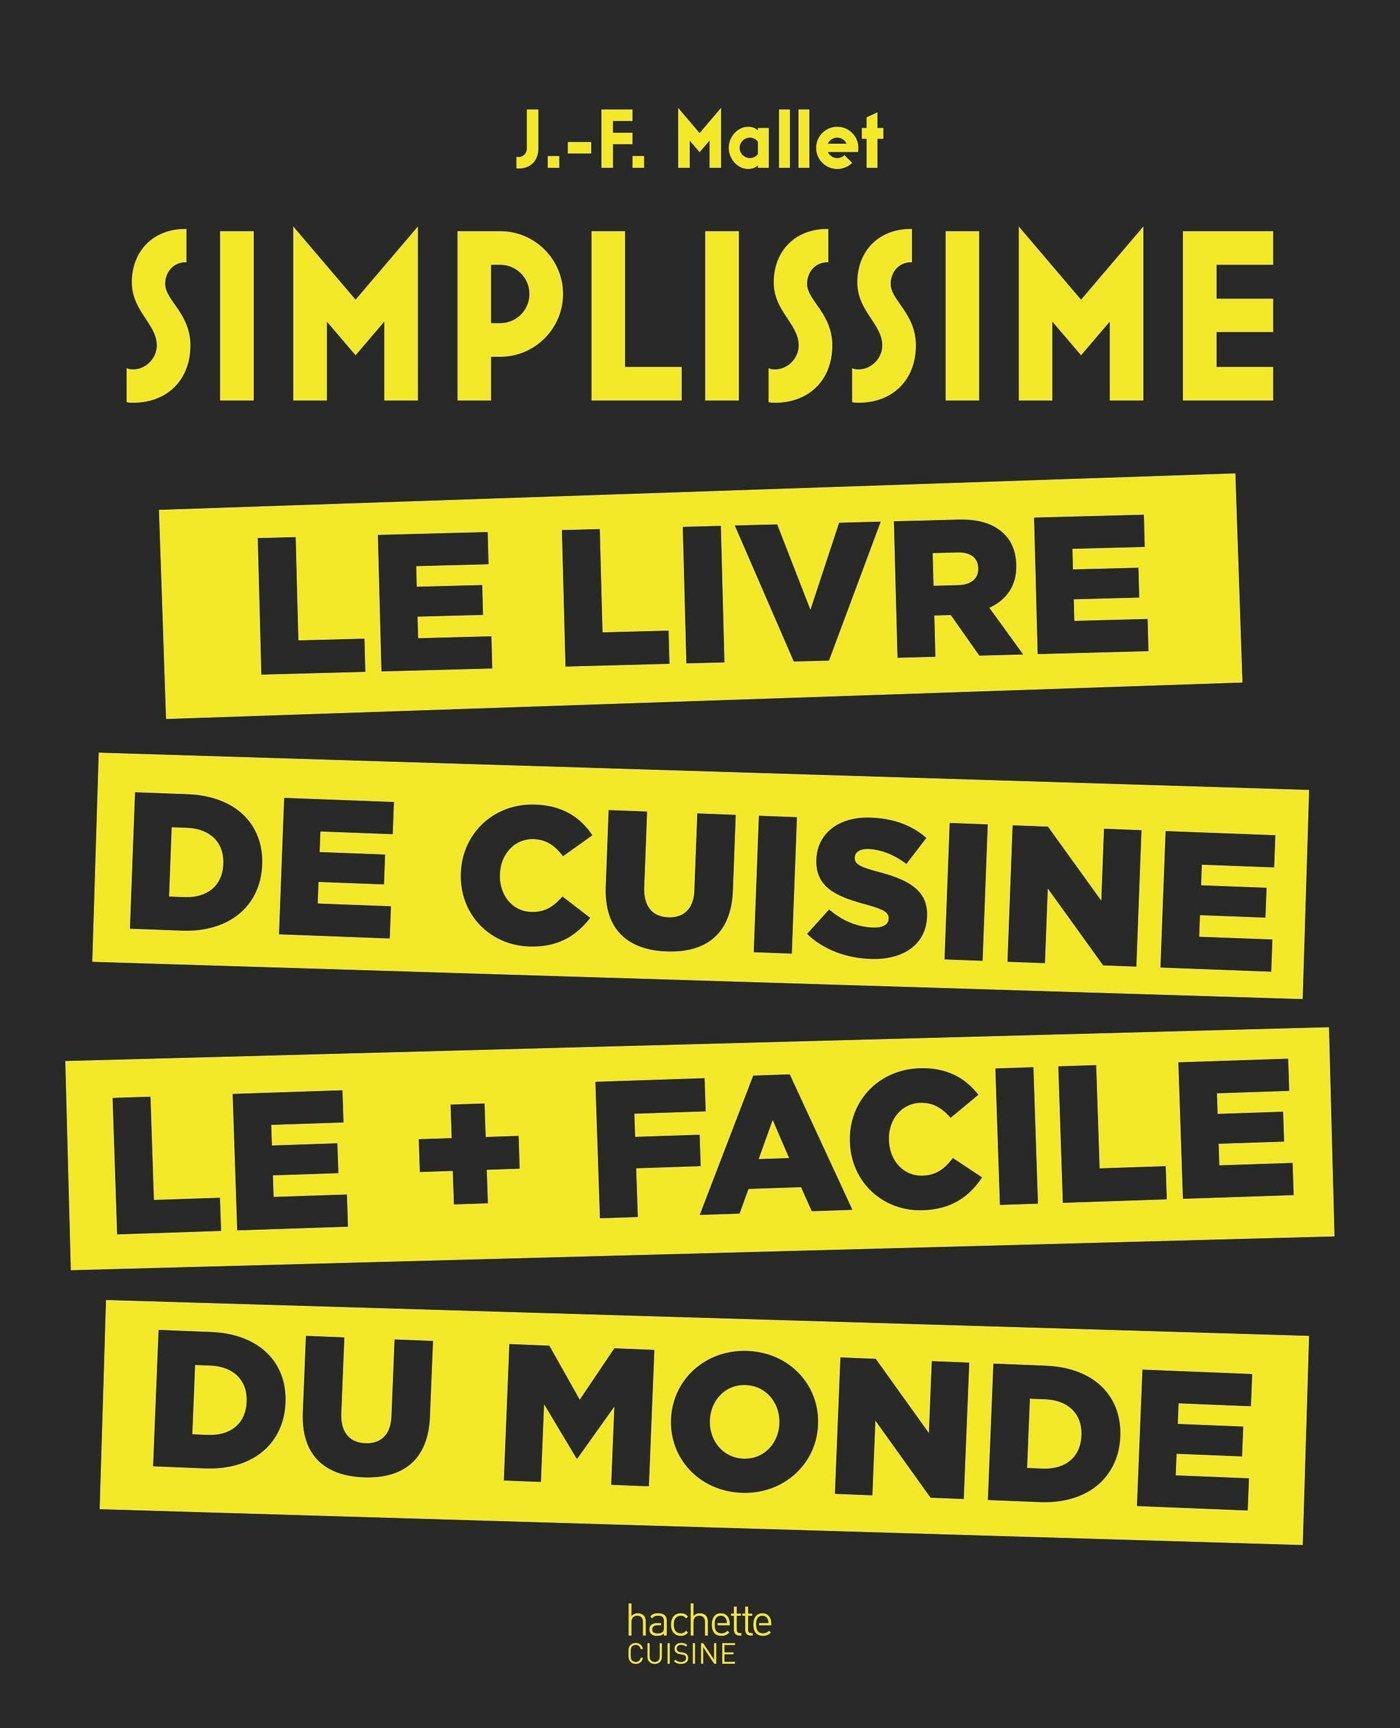 Simplissime: Le livre de cuisine le + facile du monde: Amazon.es: Jean-François Mallet: Libros en idiomas extranjeros